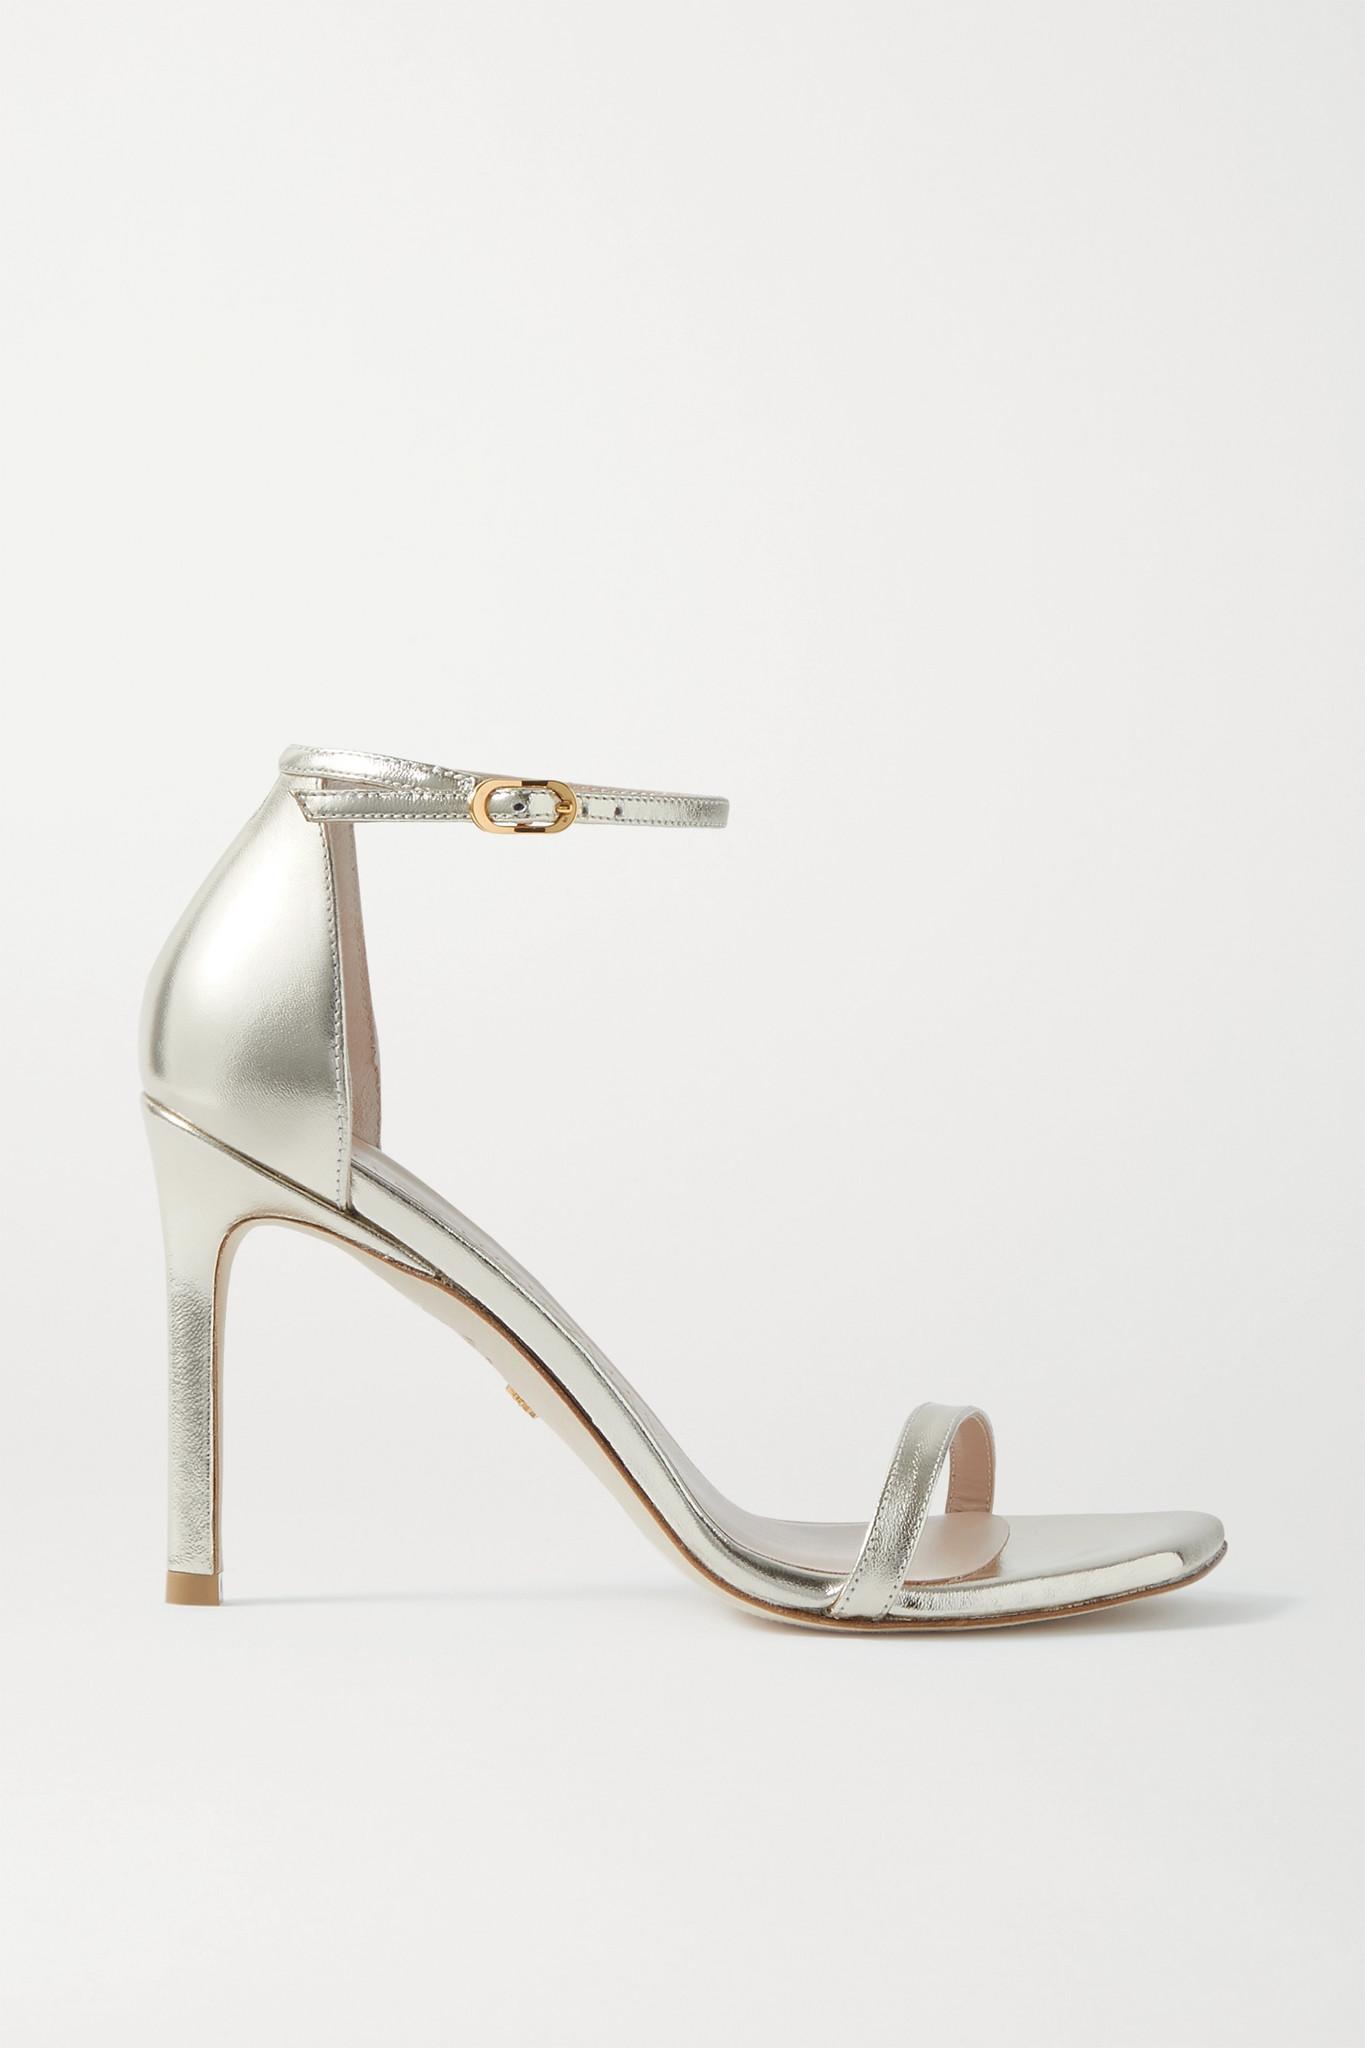 STUART WEITZMAN - Amelina 金属感皮革凉鞋 - 金色 - IT41.5